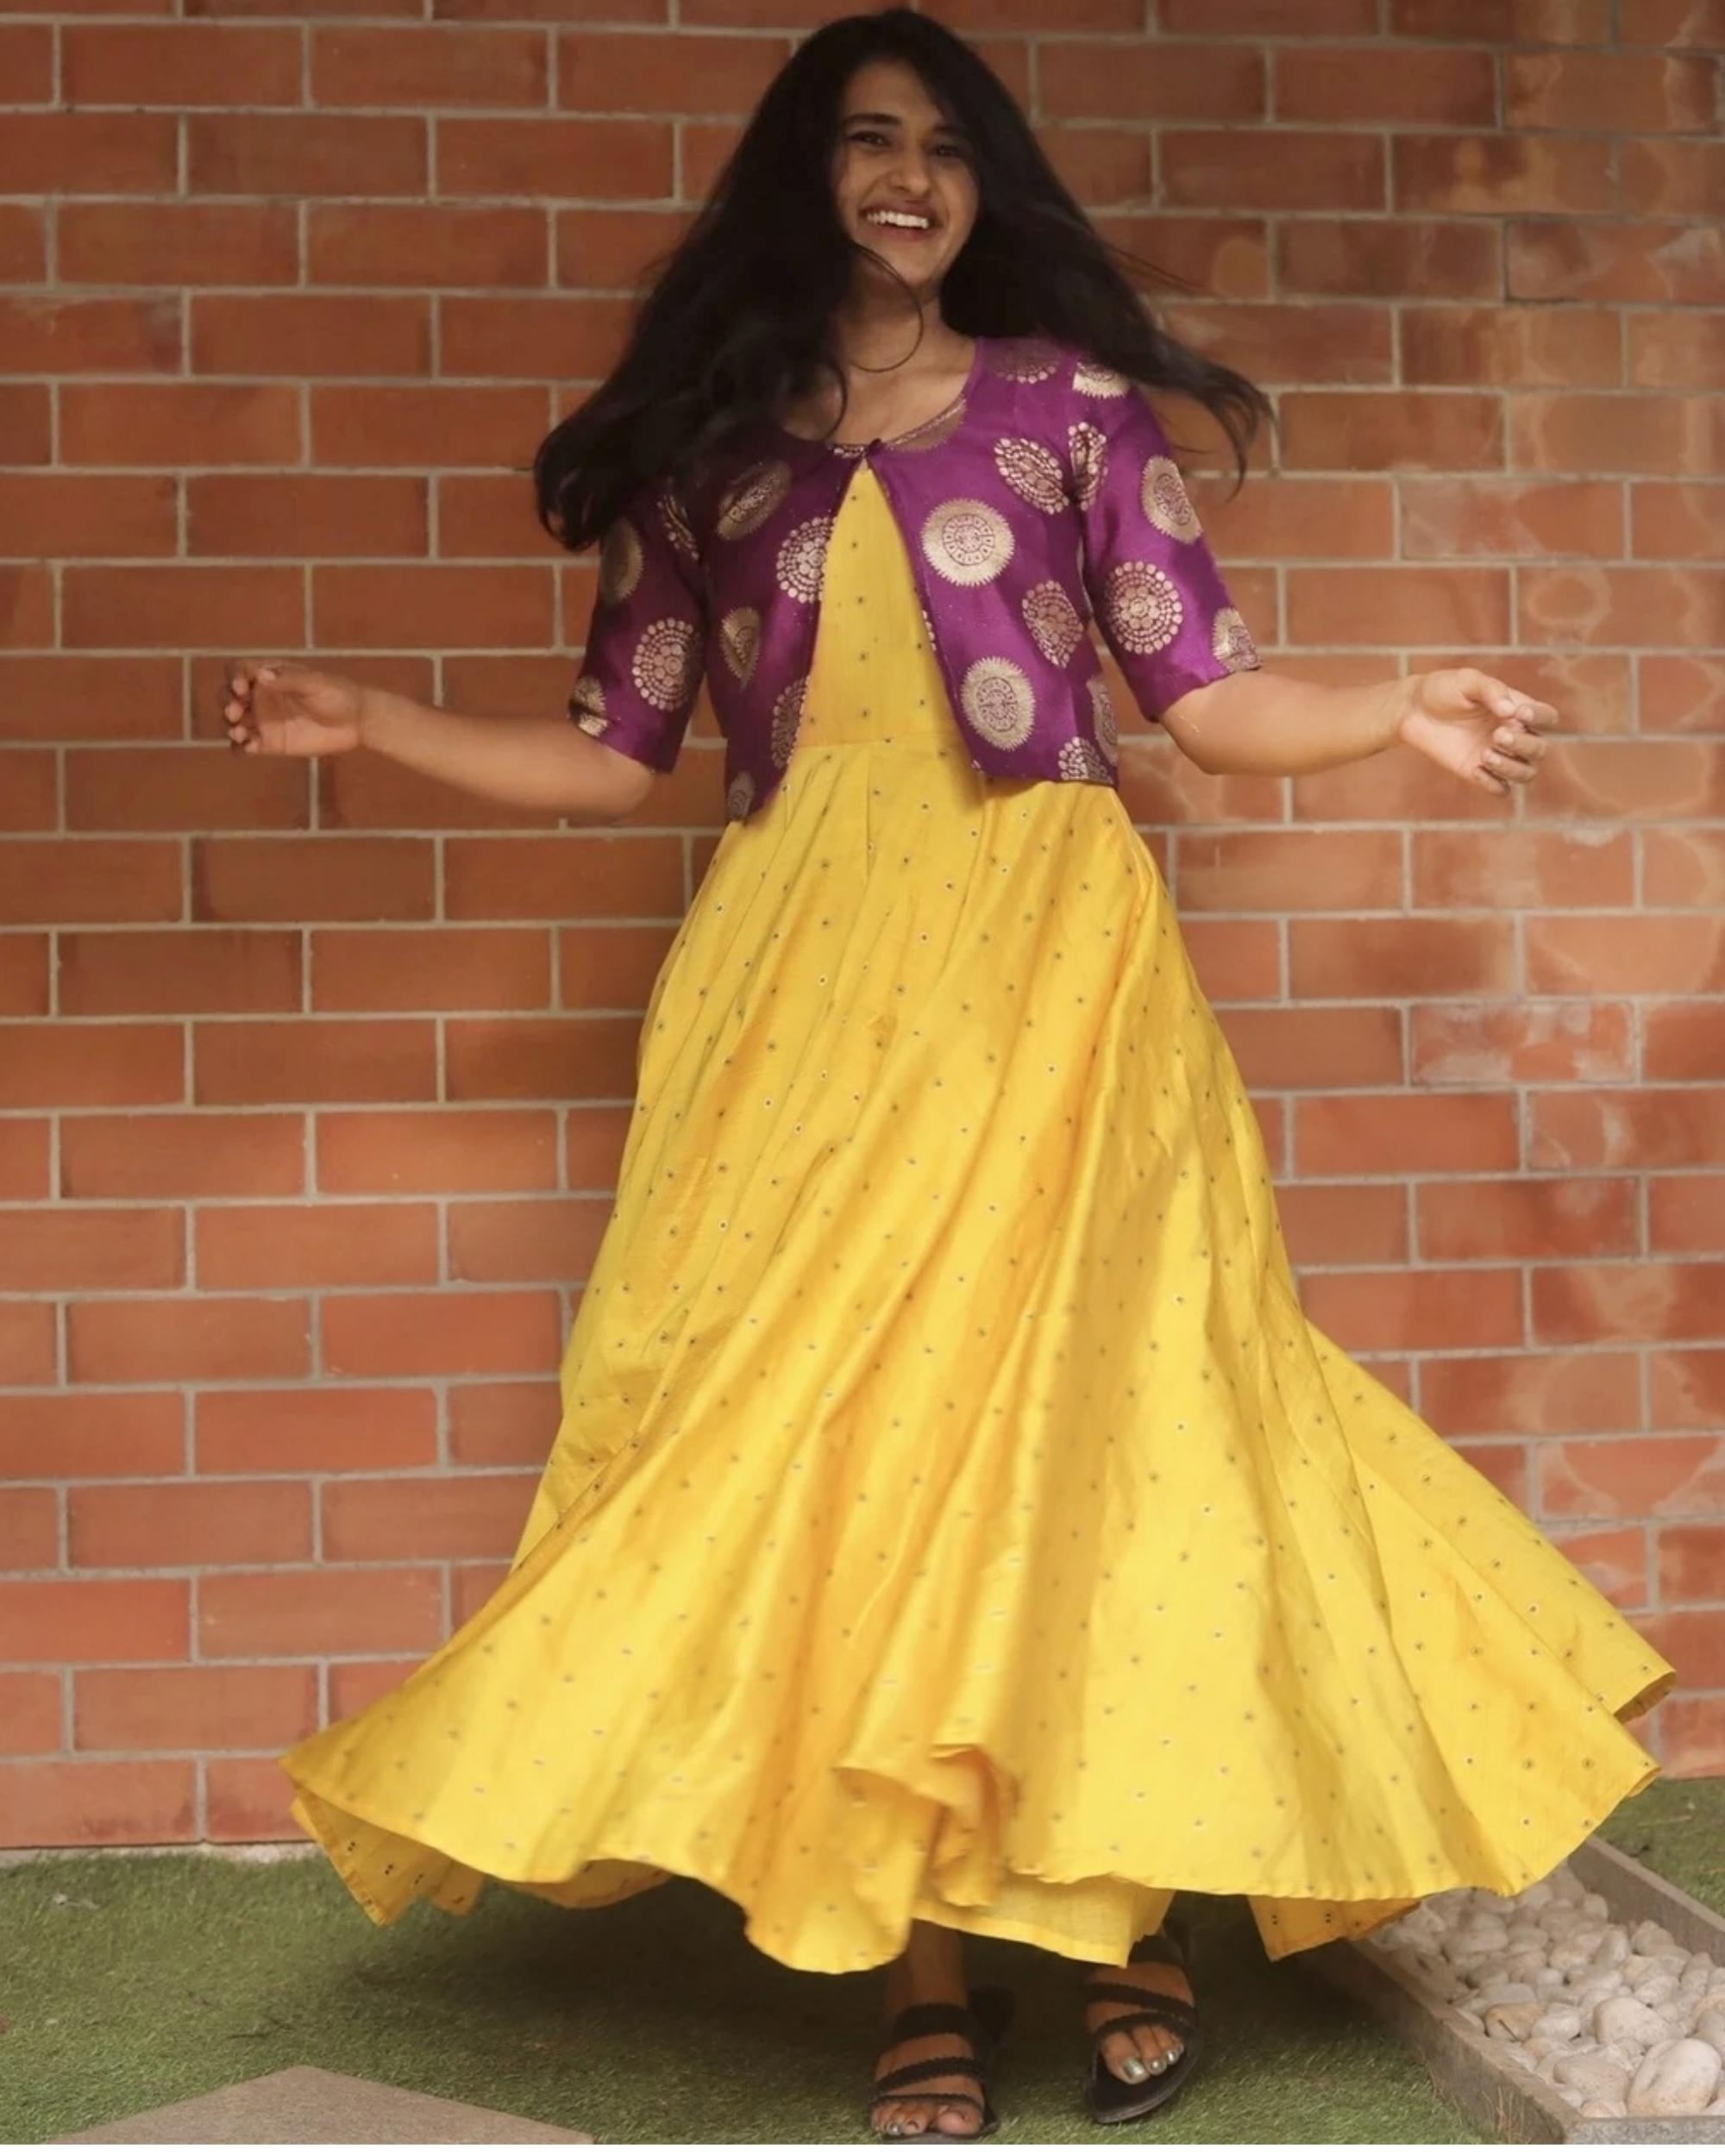 Yellow silk dress with purple jacket - set of two